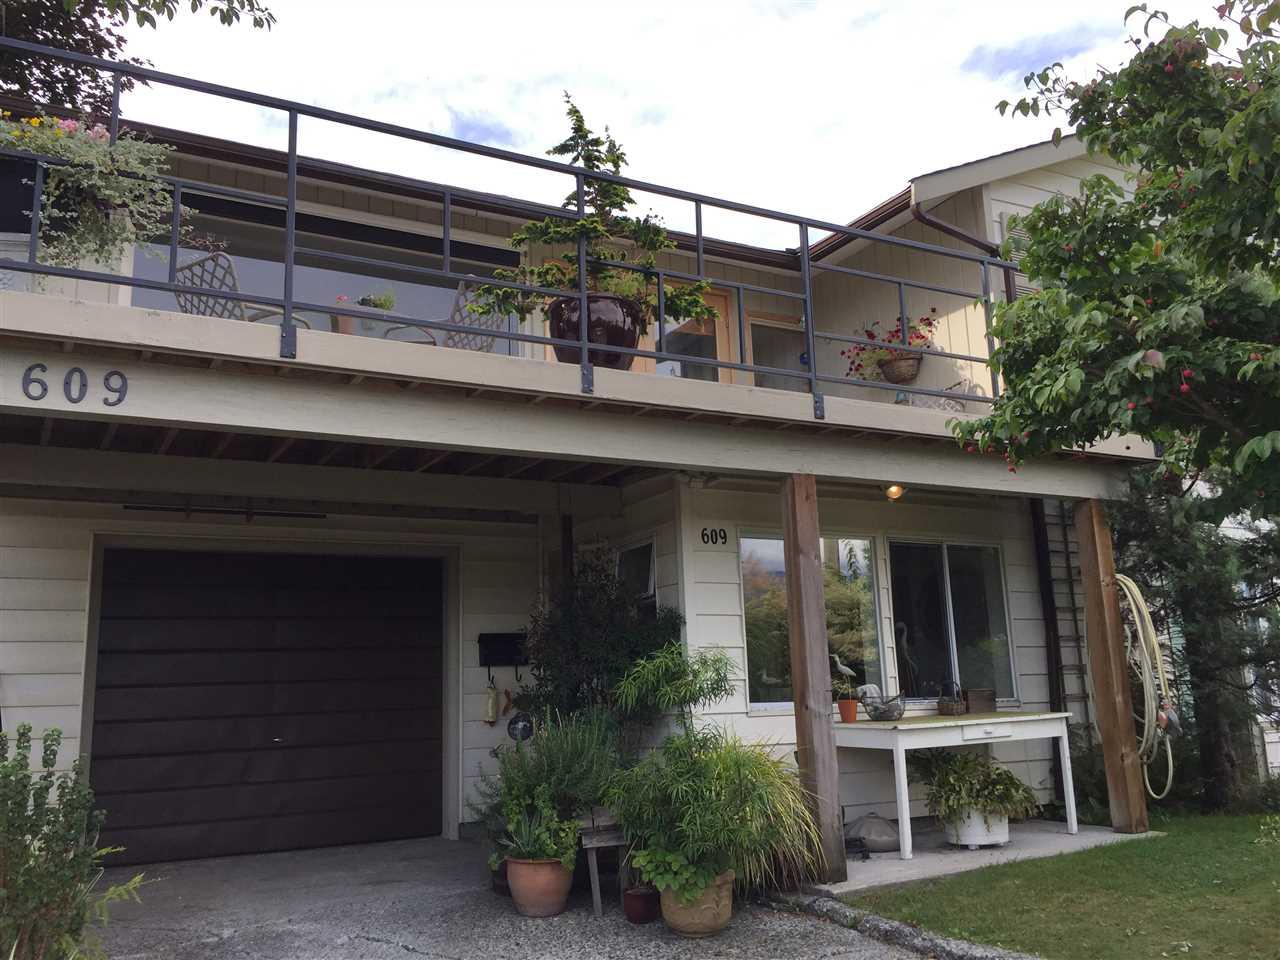 609 BAYCREST Dollarton, North Vancouver (R2204433)